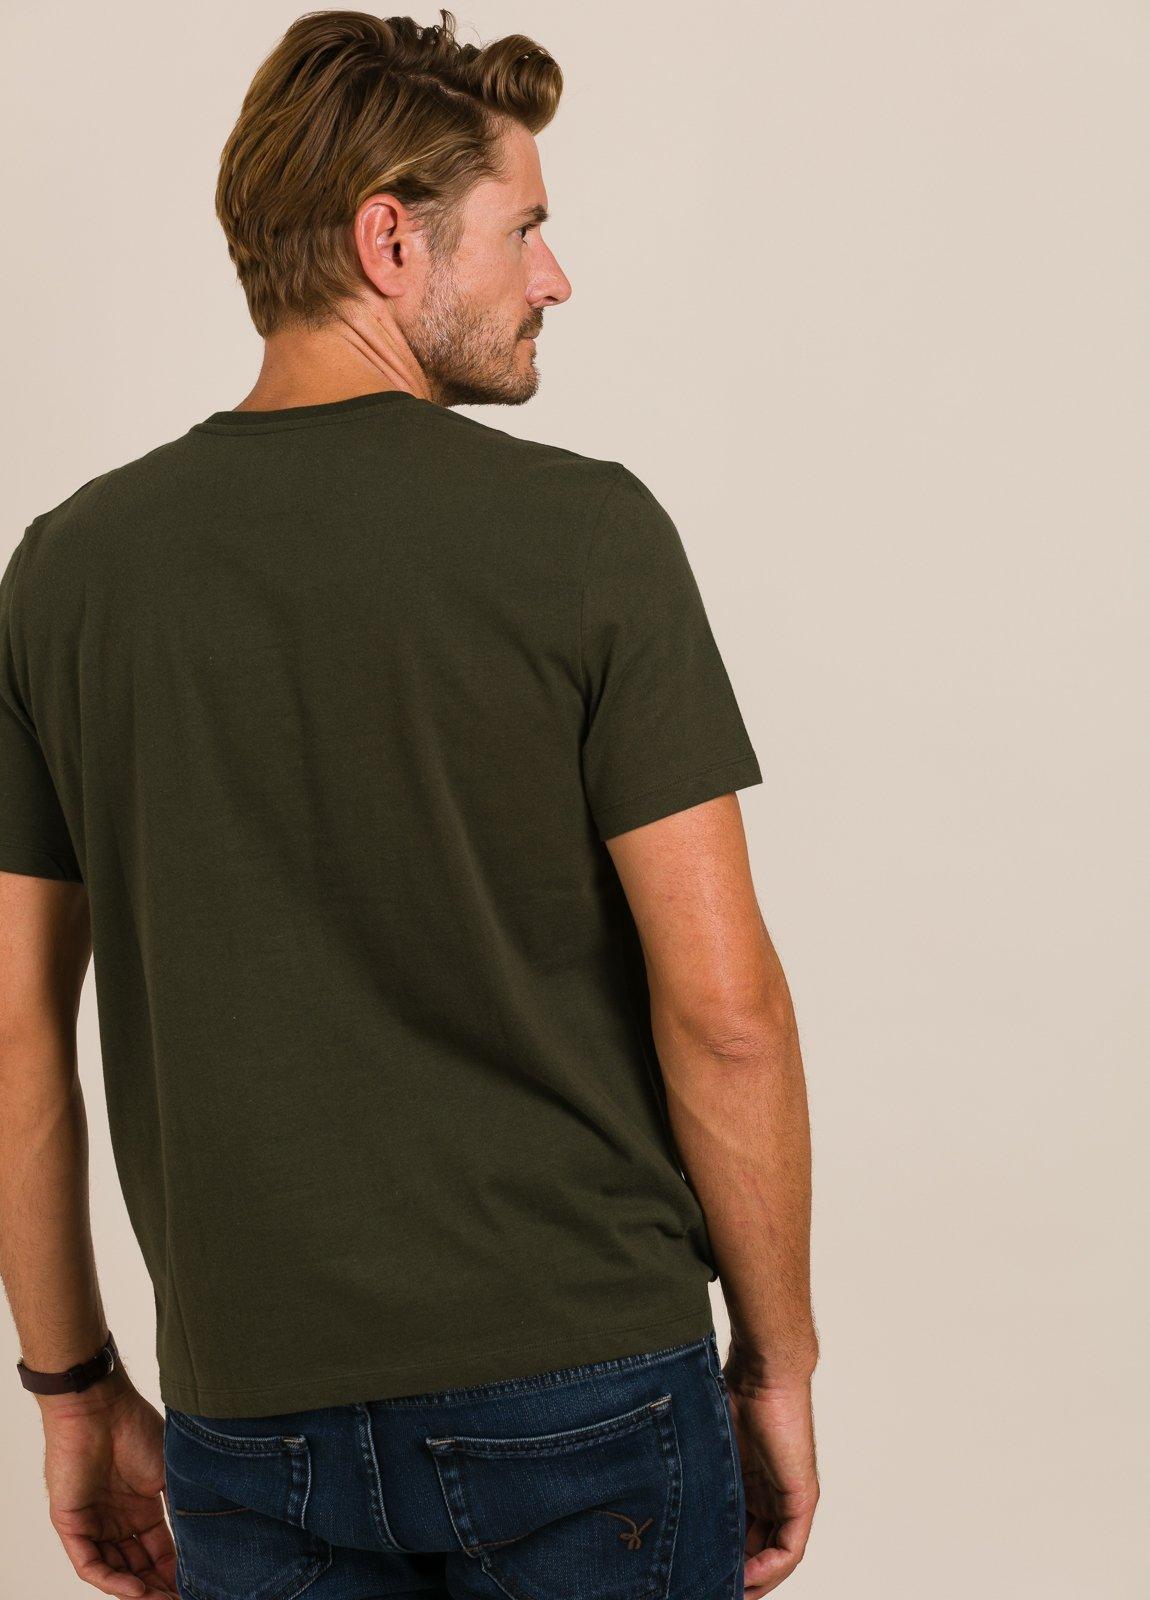 Camiseta verde ECOALF con texto estampado - Ítem1